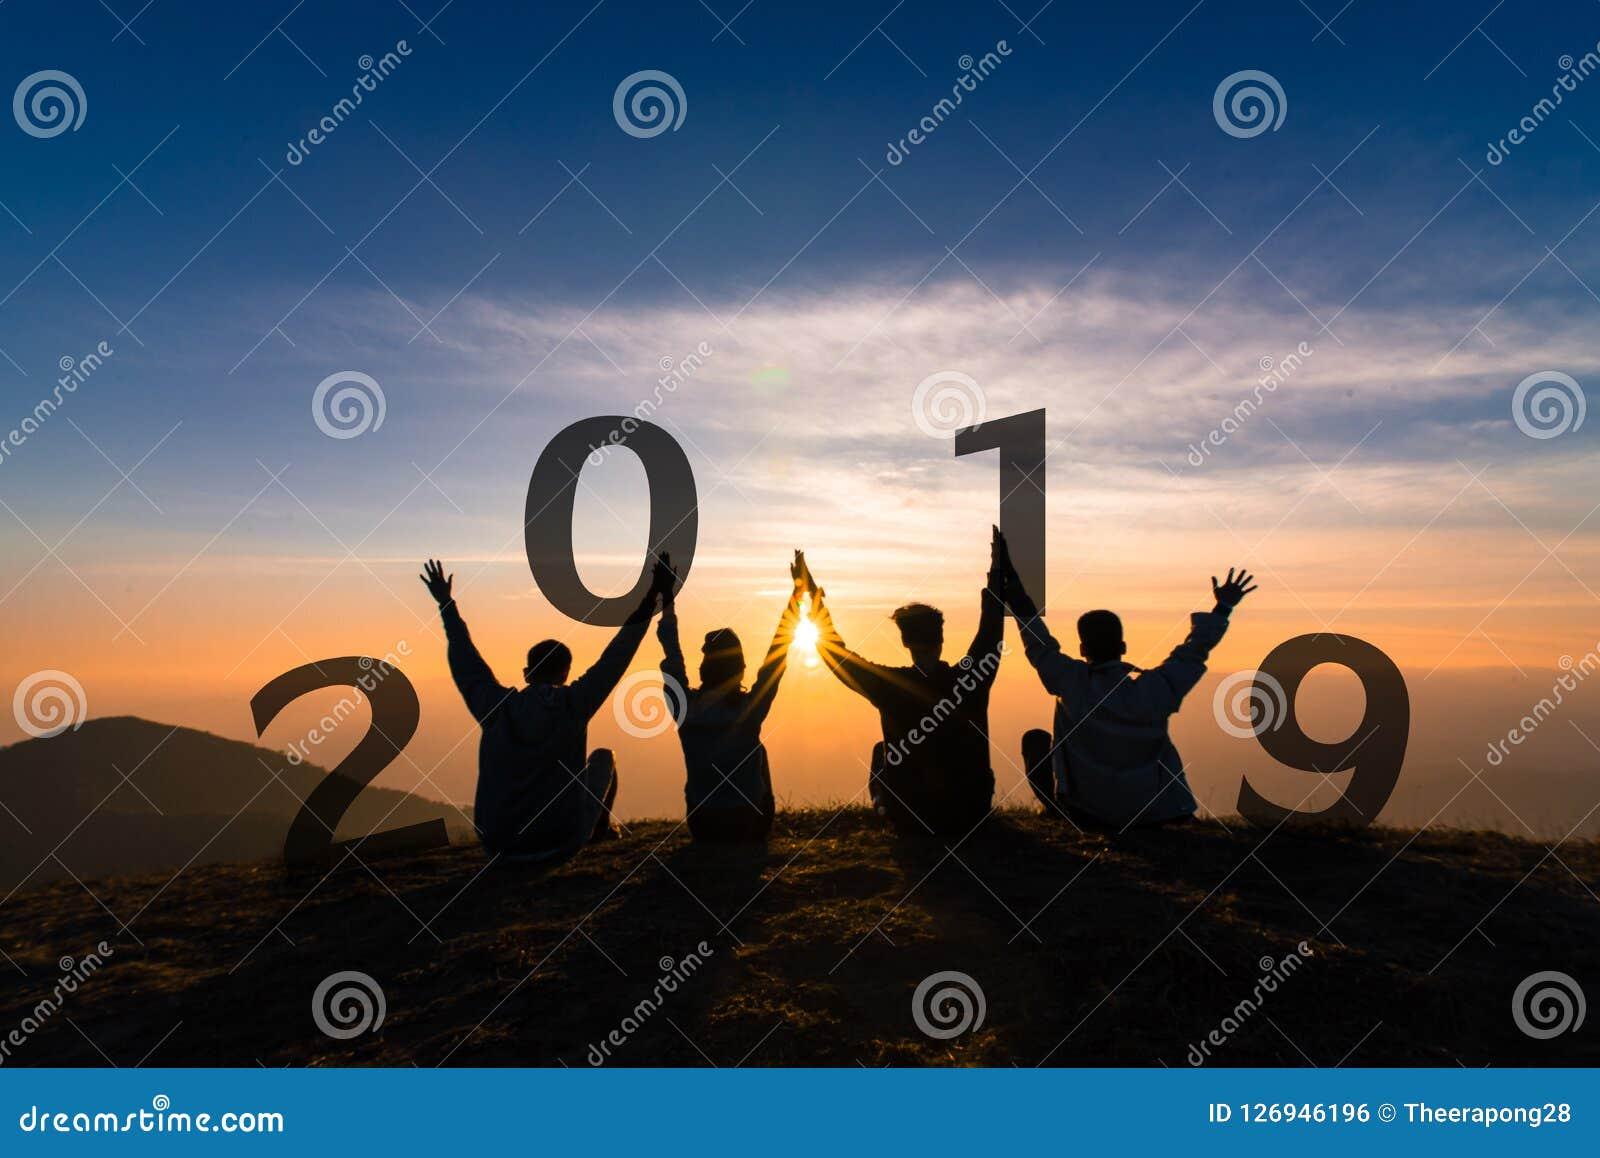 2bb4d5d742ba Silueta 2019 Del Concepto De Newyear Del Salto Y De La Mano Jovenes ...